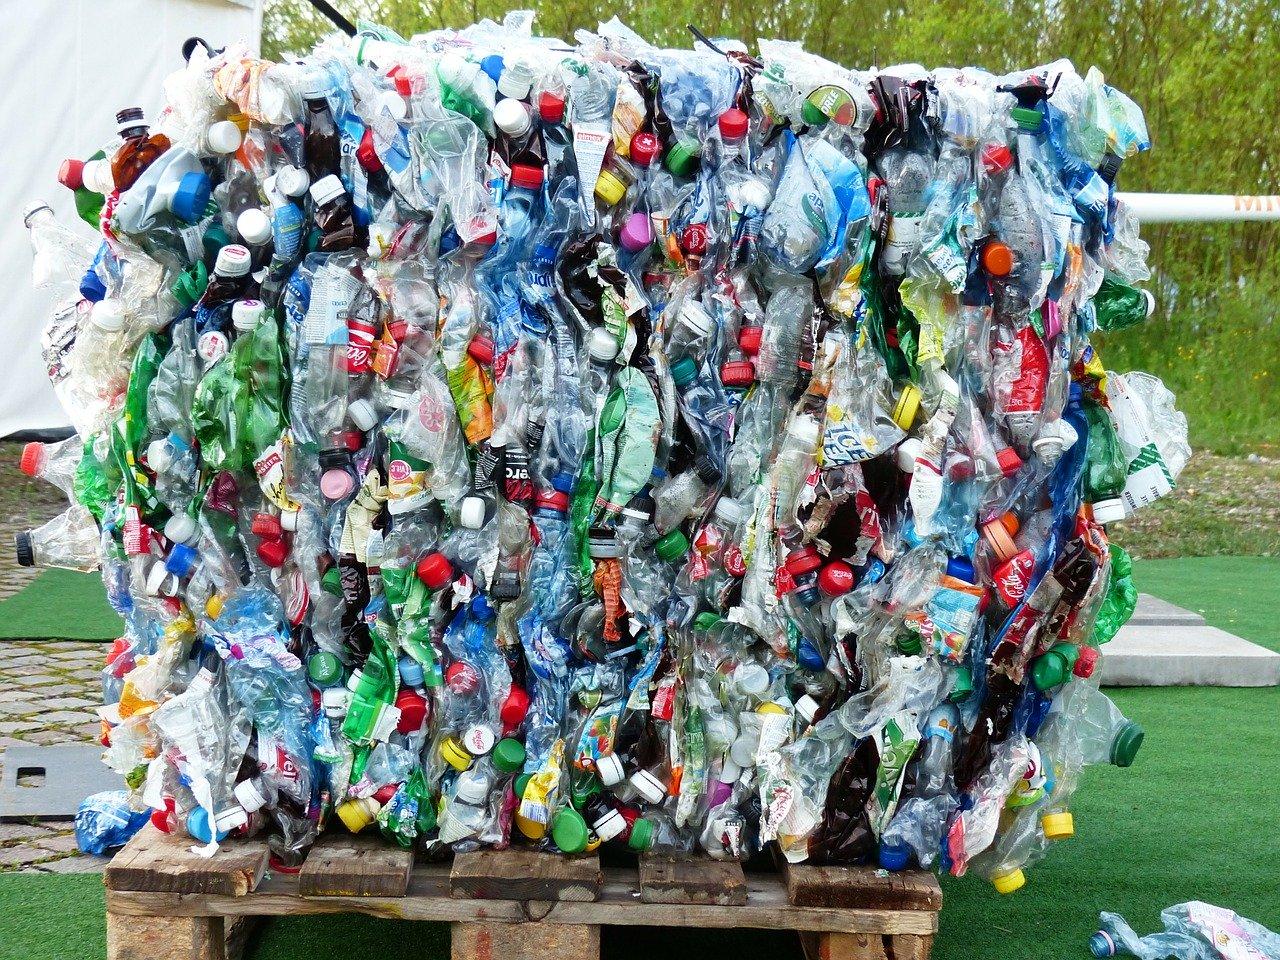 México recicla 340 mil toneladas de residuos plásticos al año: ANIPAC